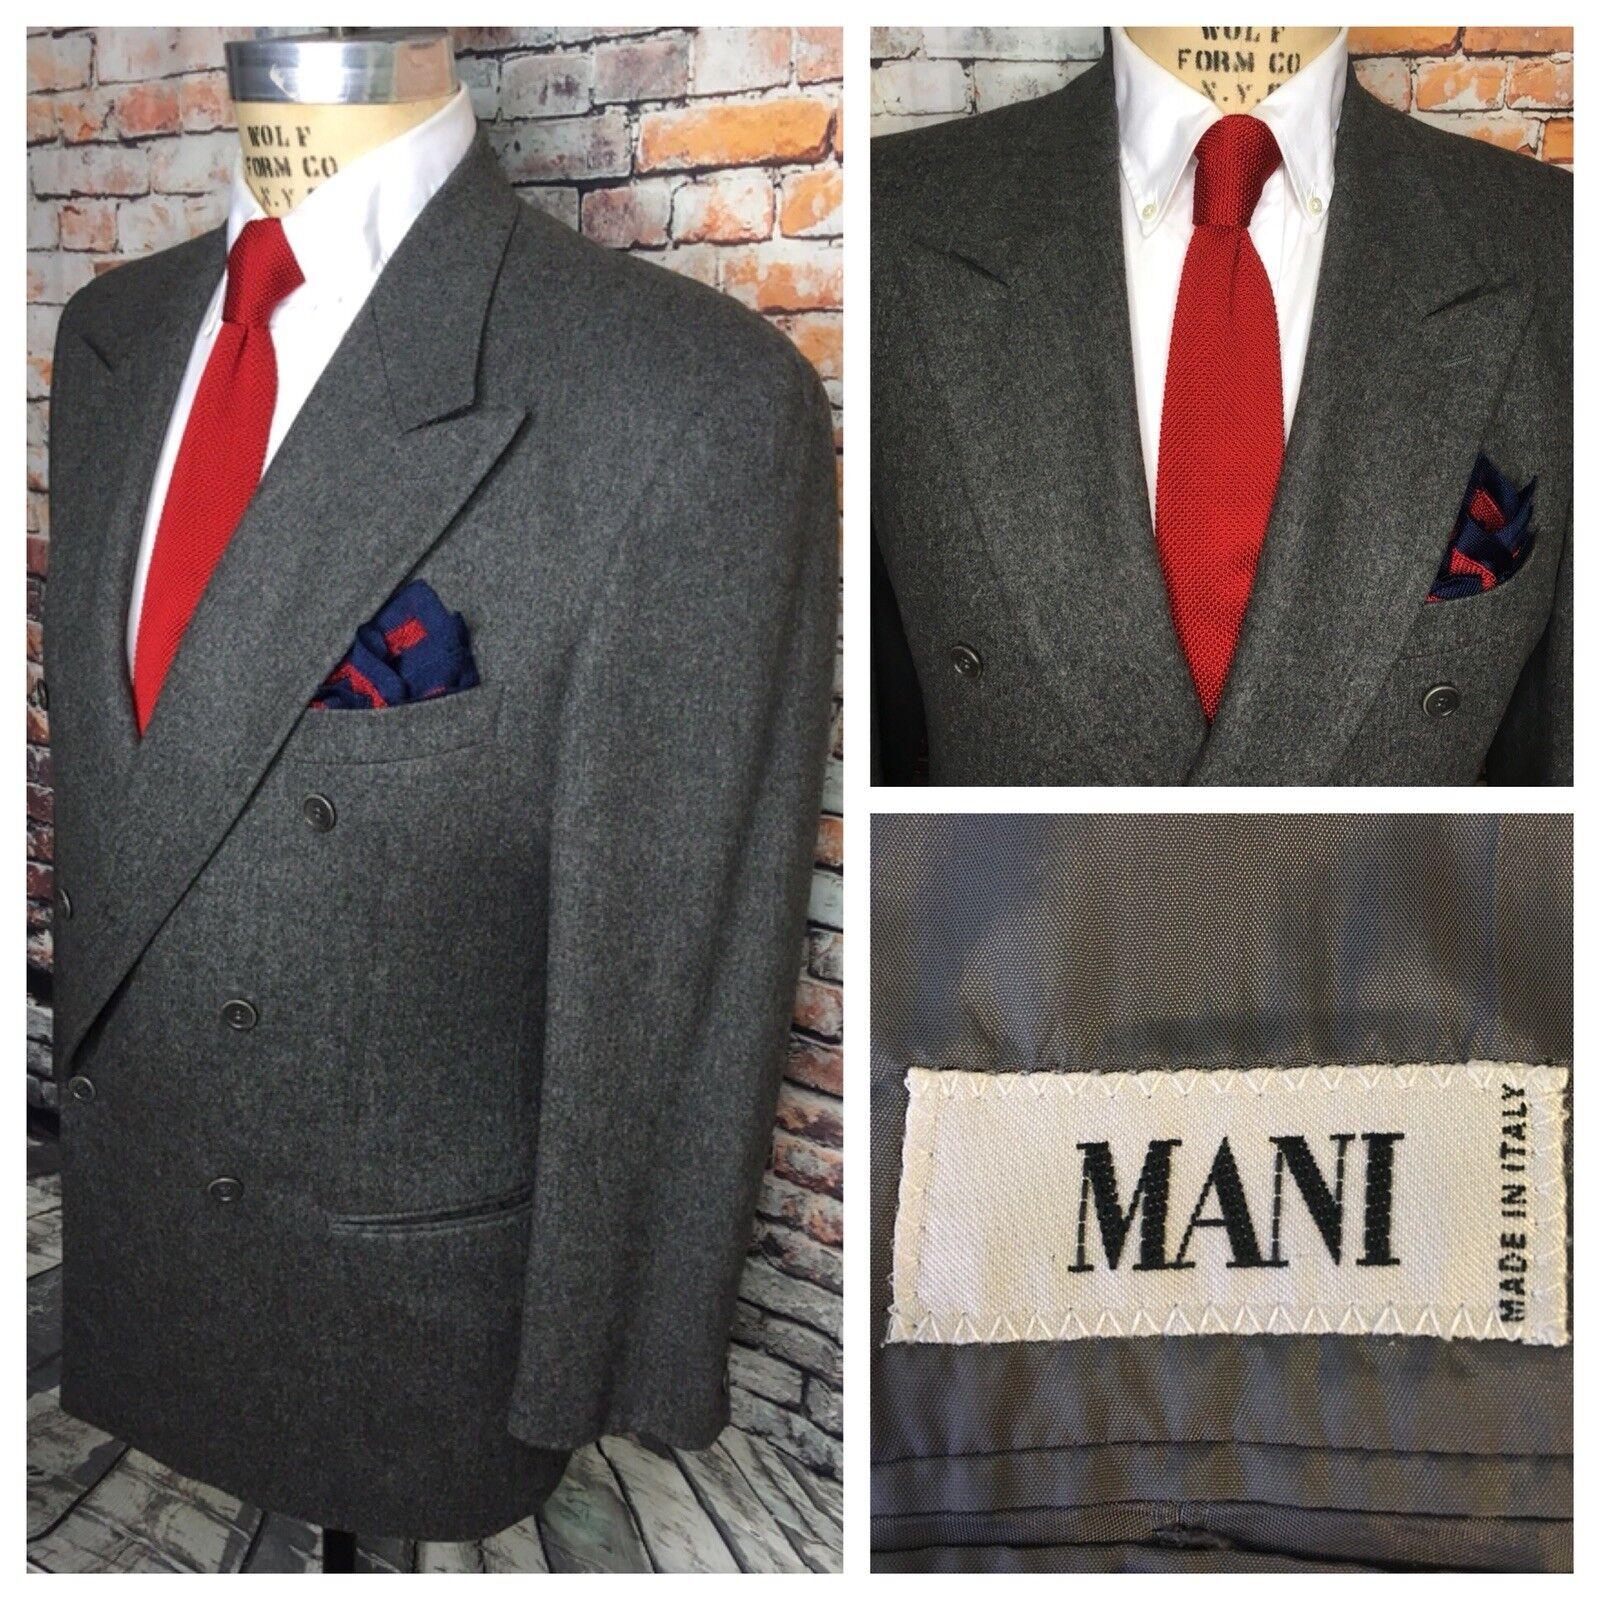 Mani Giorgio Armani Mens Größe 42L grau Double Breasted Flannel Blazer Jacket